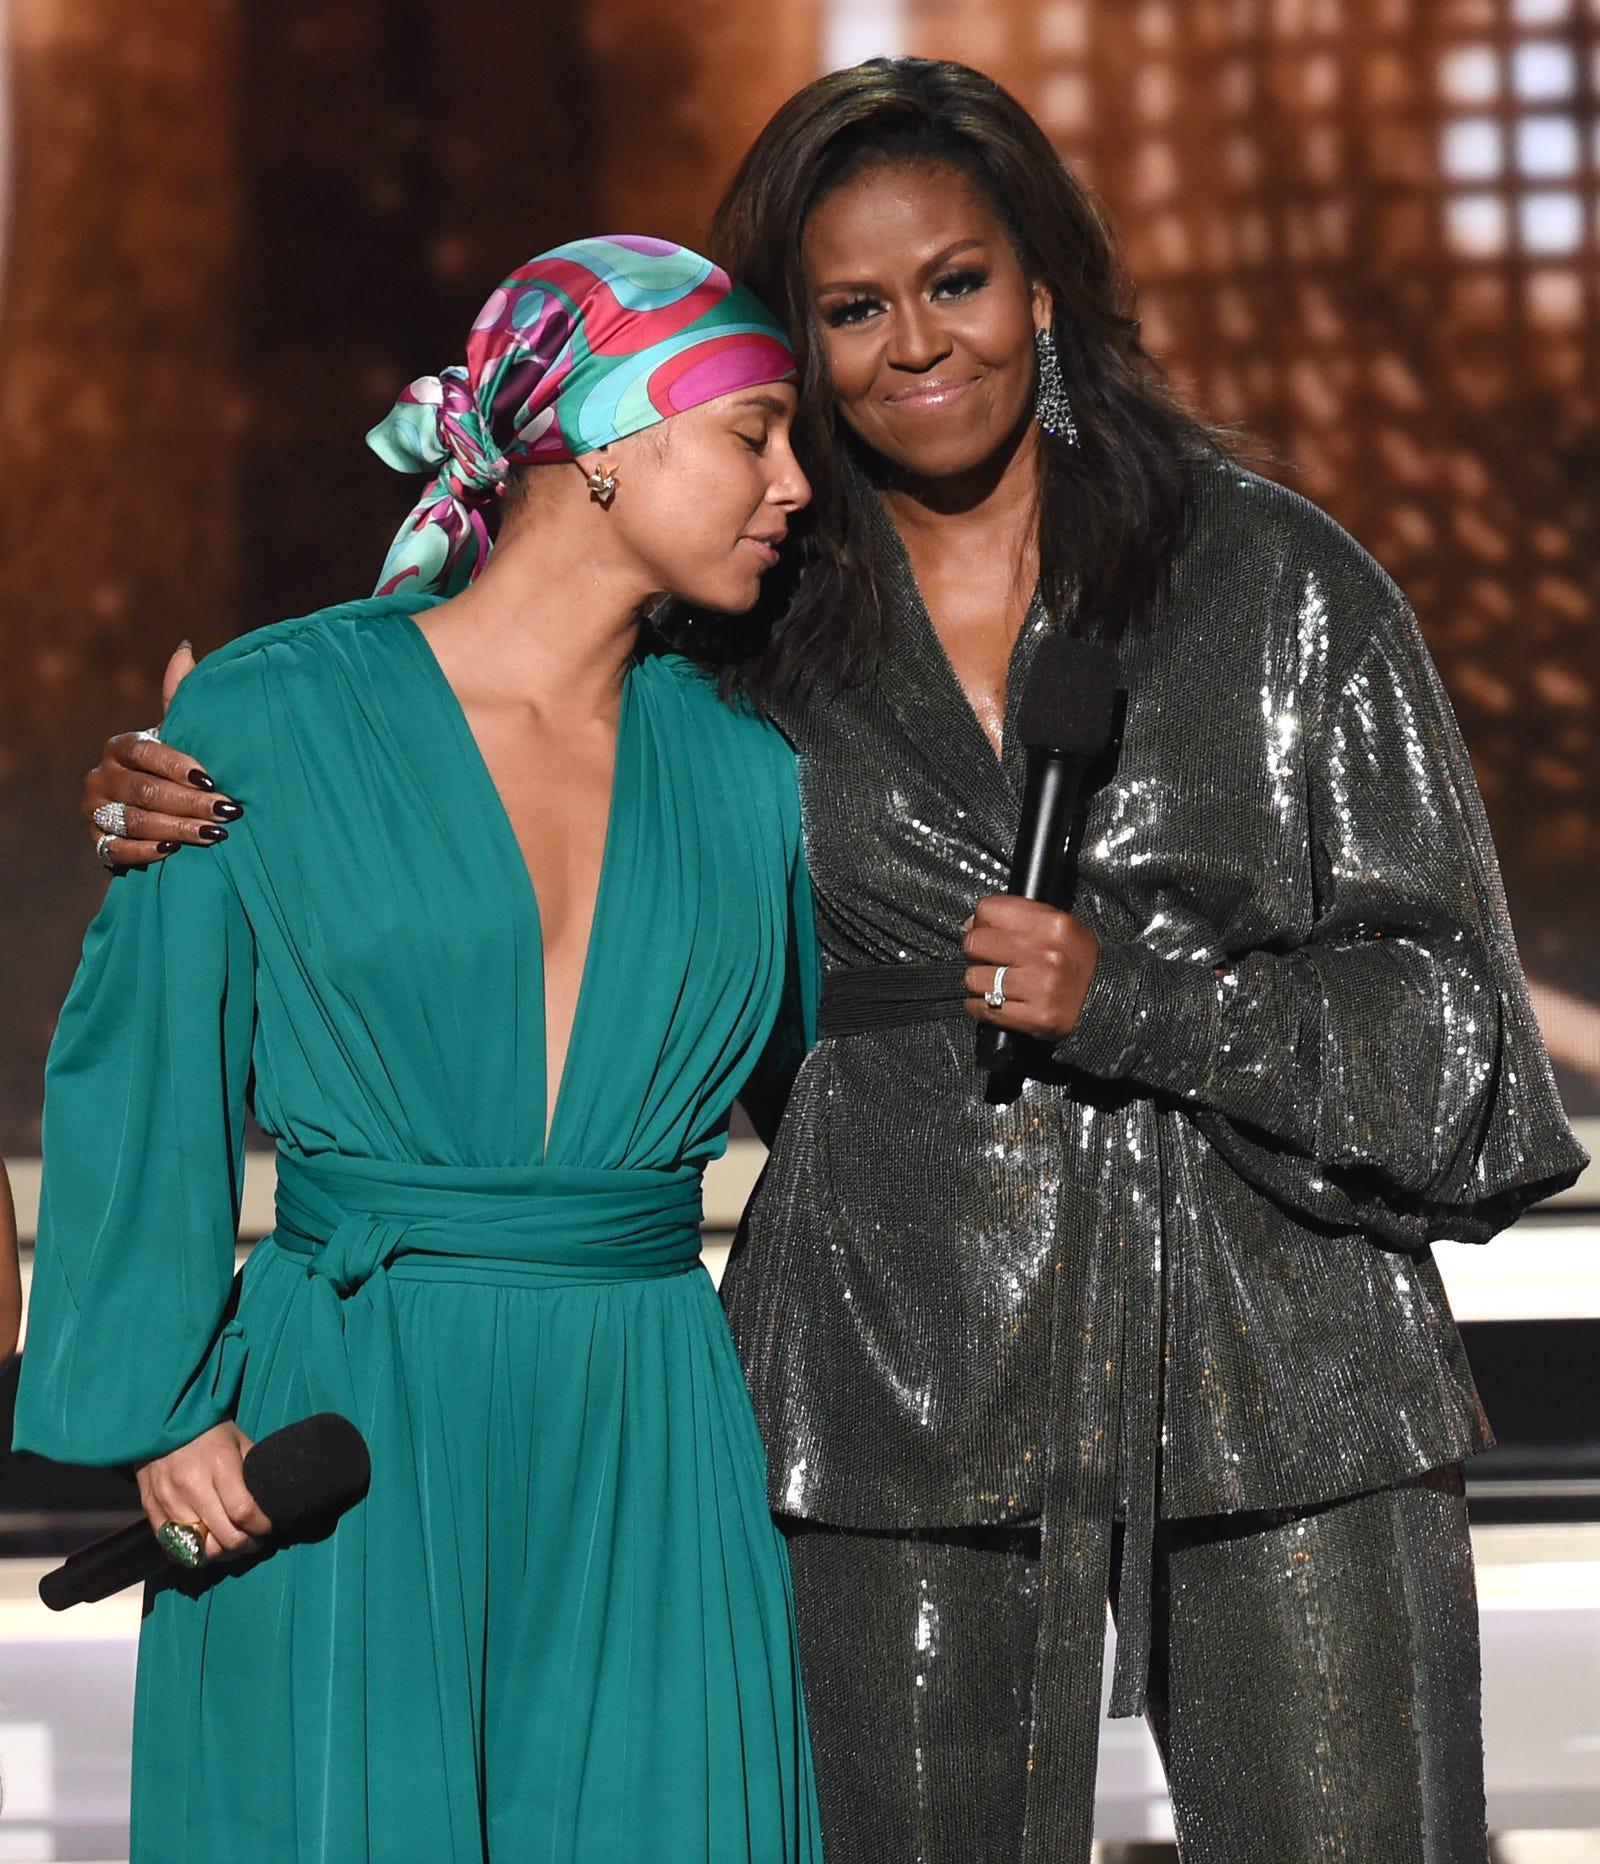 Alicia Keys (l) hugs Michelle Obama, who is wearing custom Sachin and Babi.